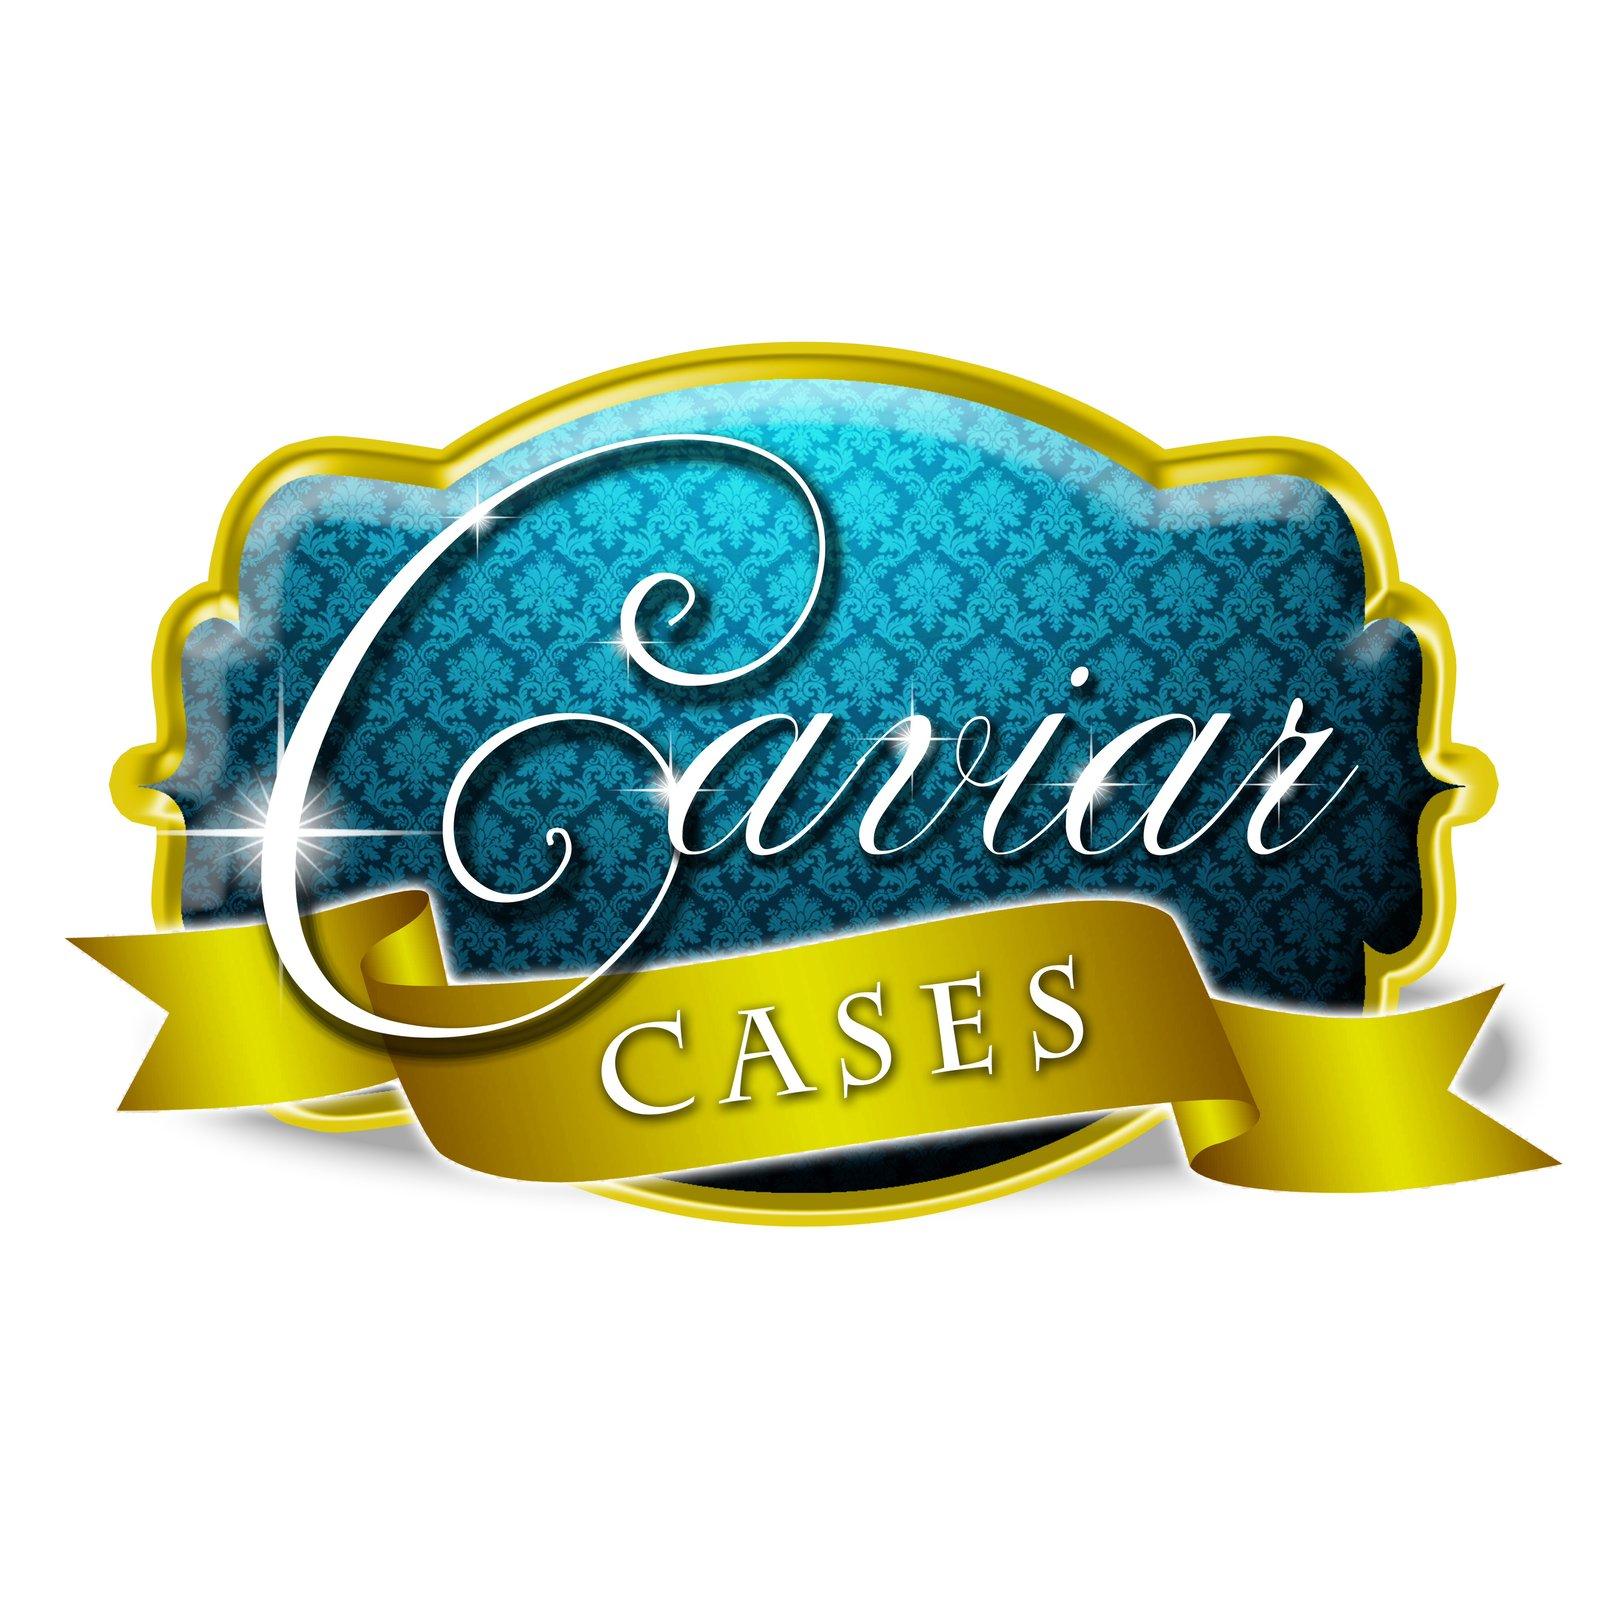 Caviar Cases